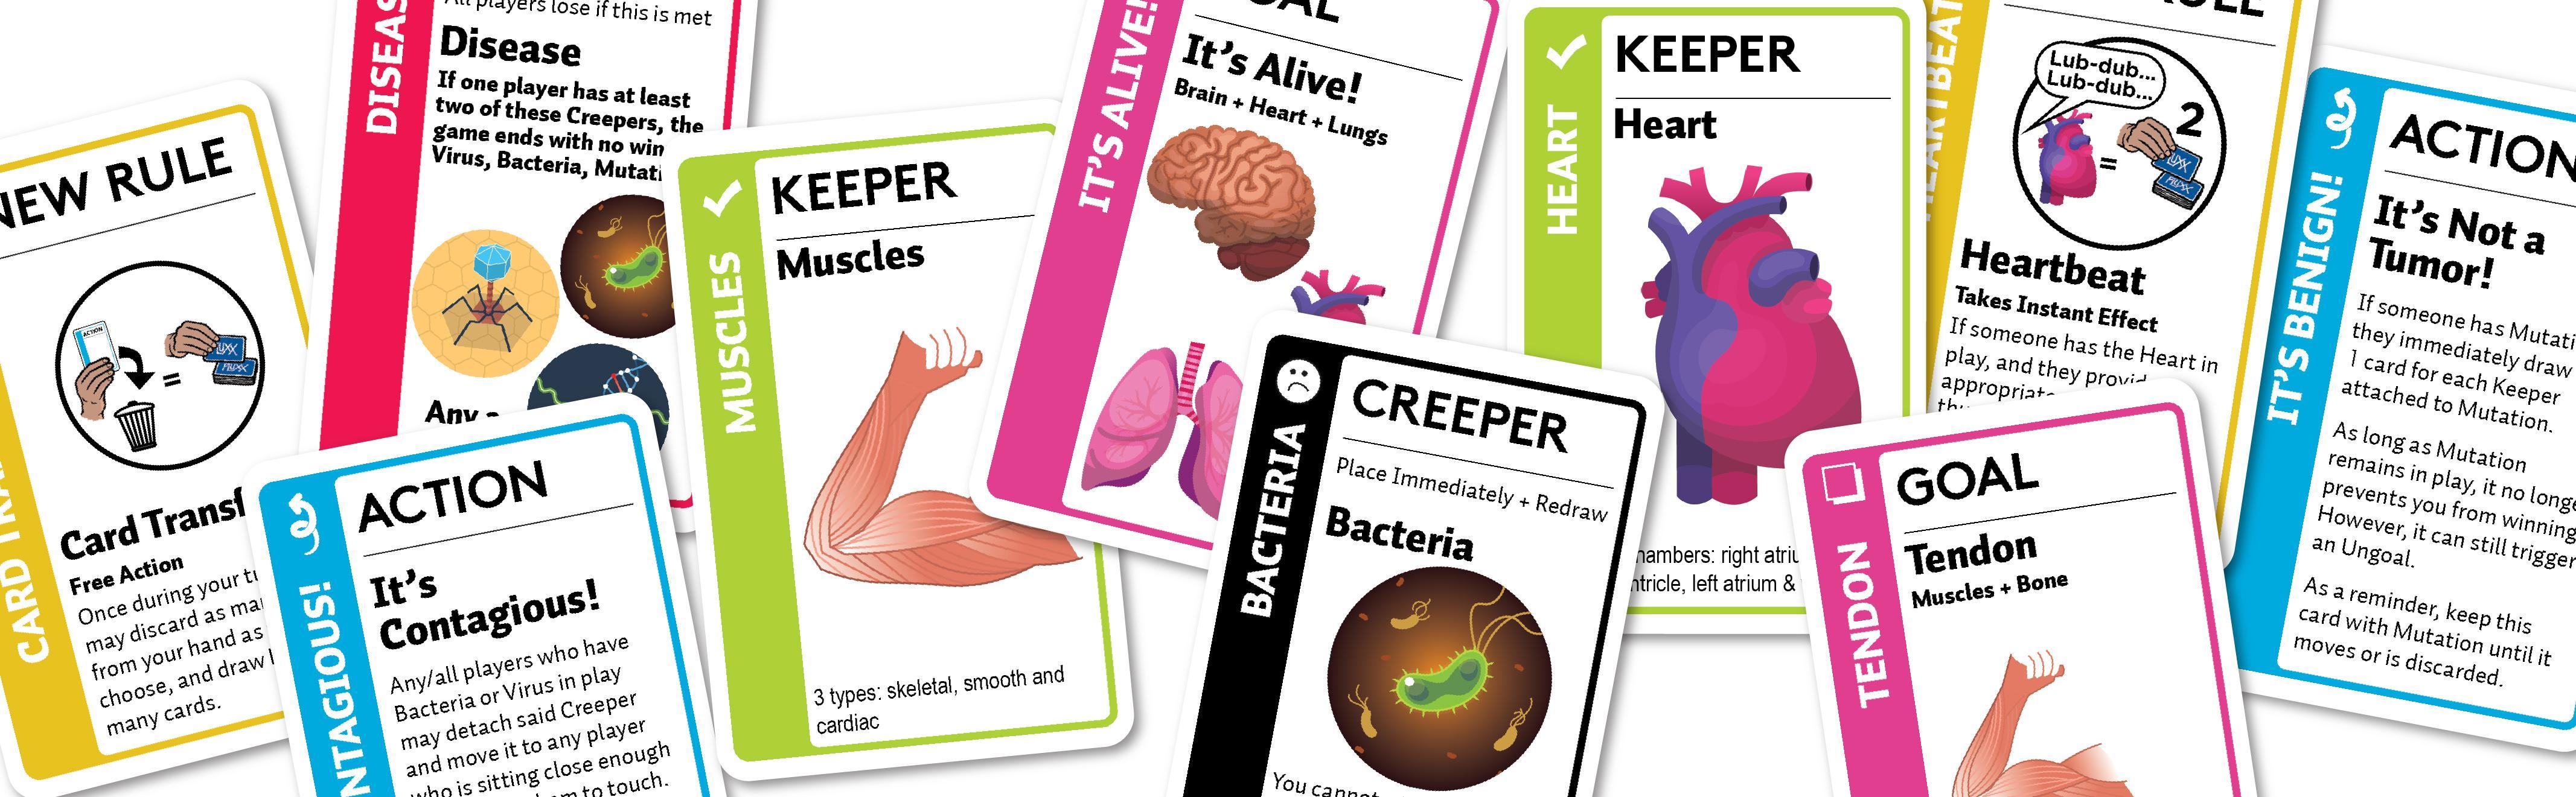 Amazon.com: Fluxx Anatomy Card Game: Toys & Games